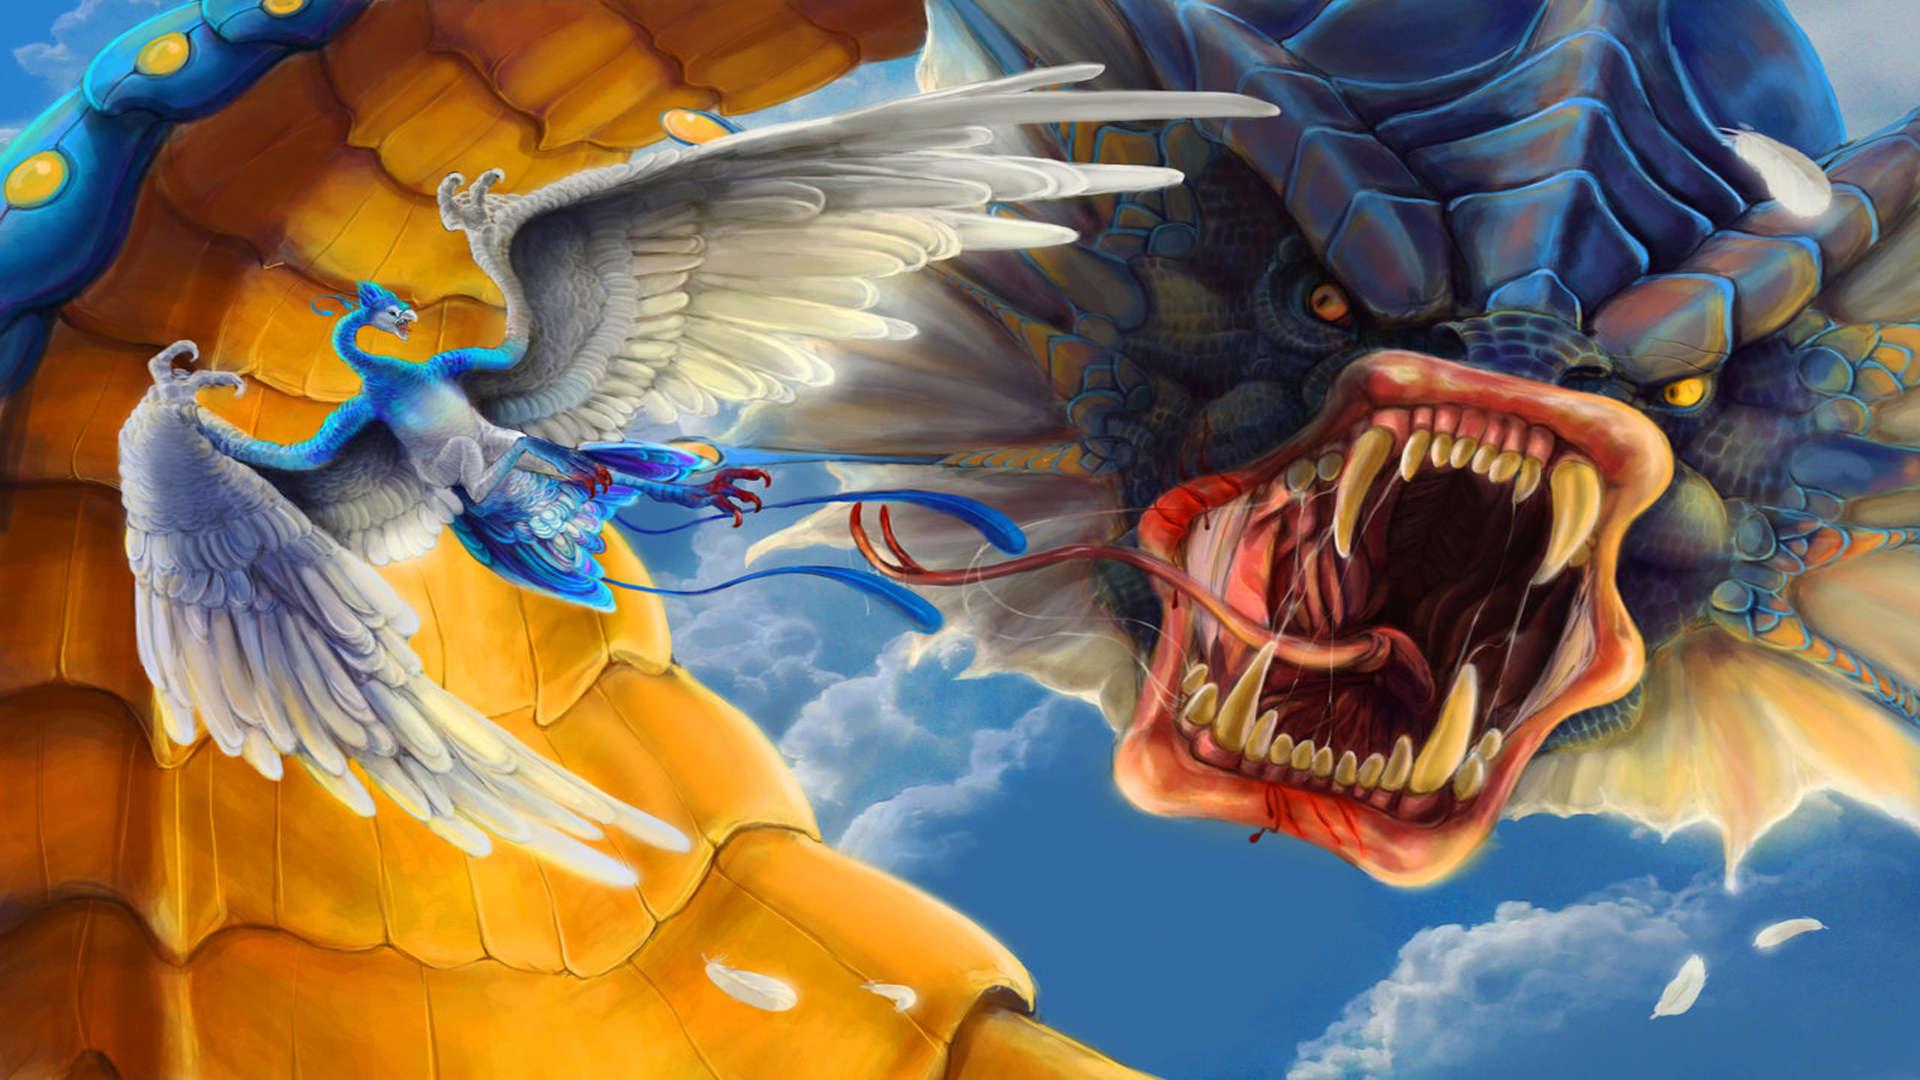 Pokemon HD Wallpapers 1080p - WallpaperSafari